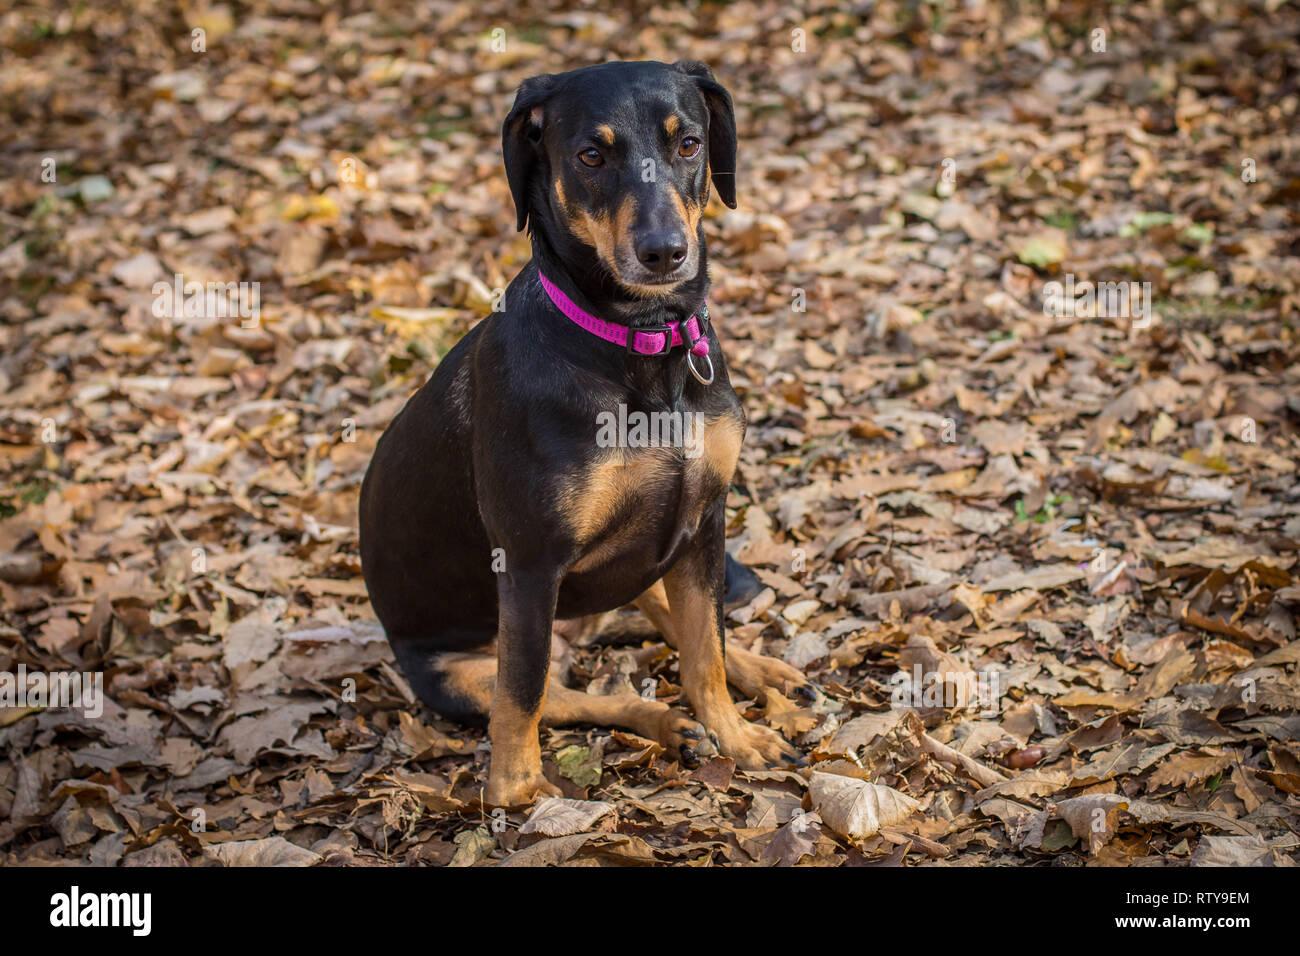 Cute black brown dog sitting in fallen leaves Stock Photo